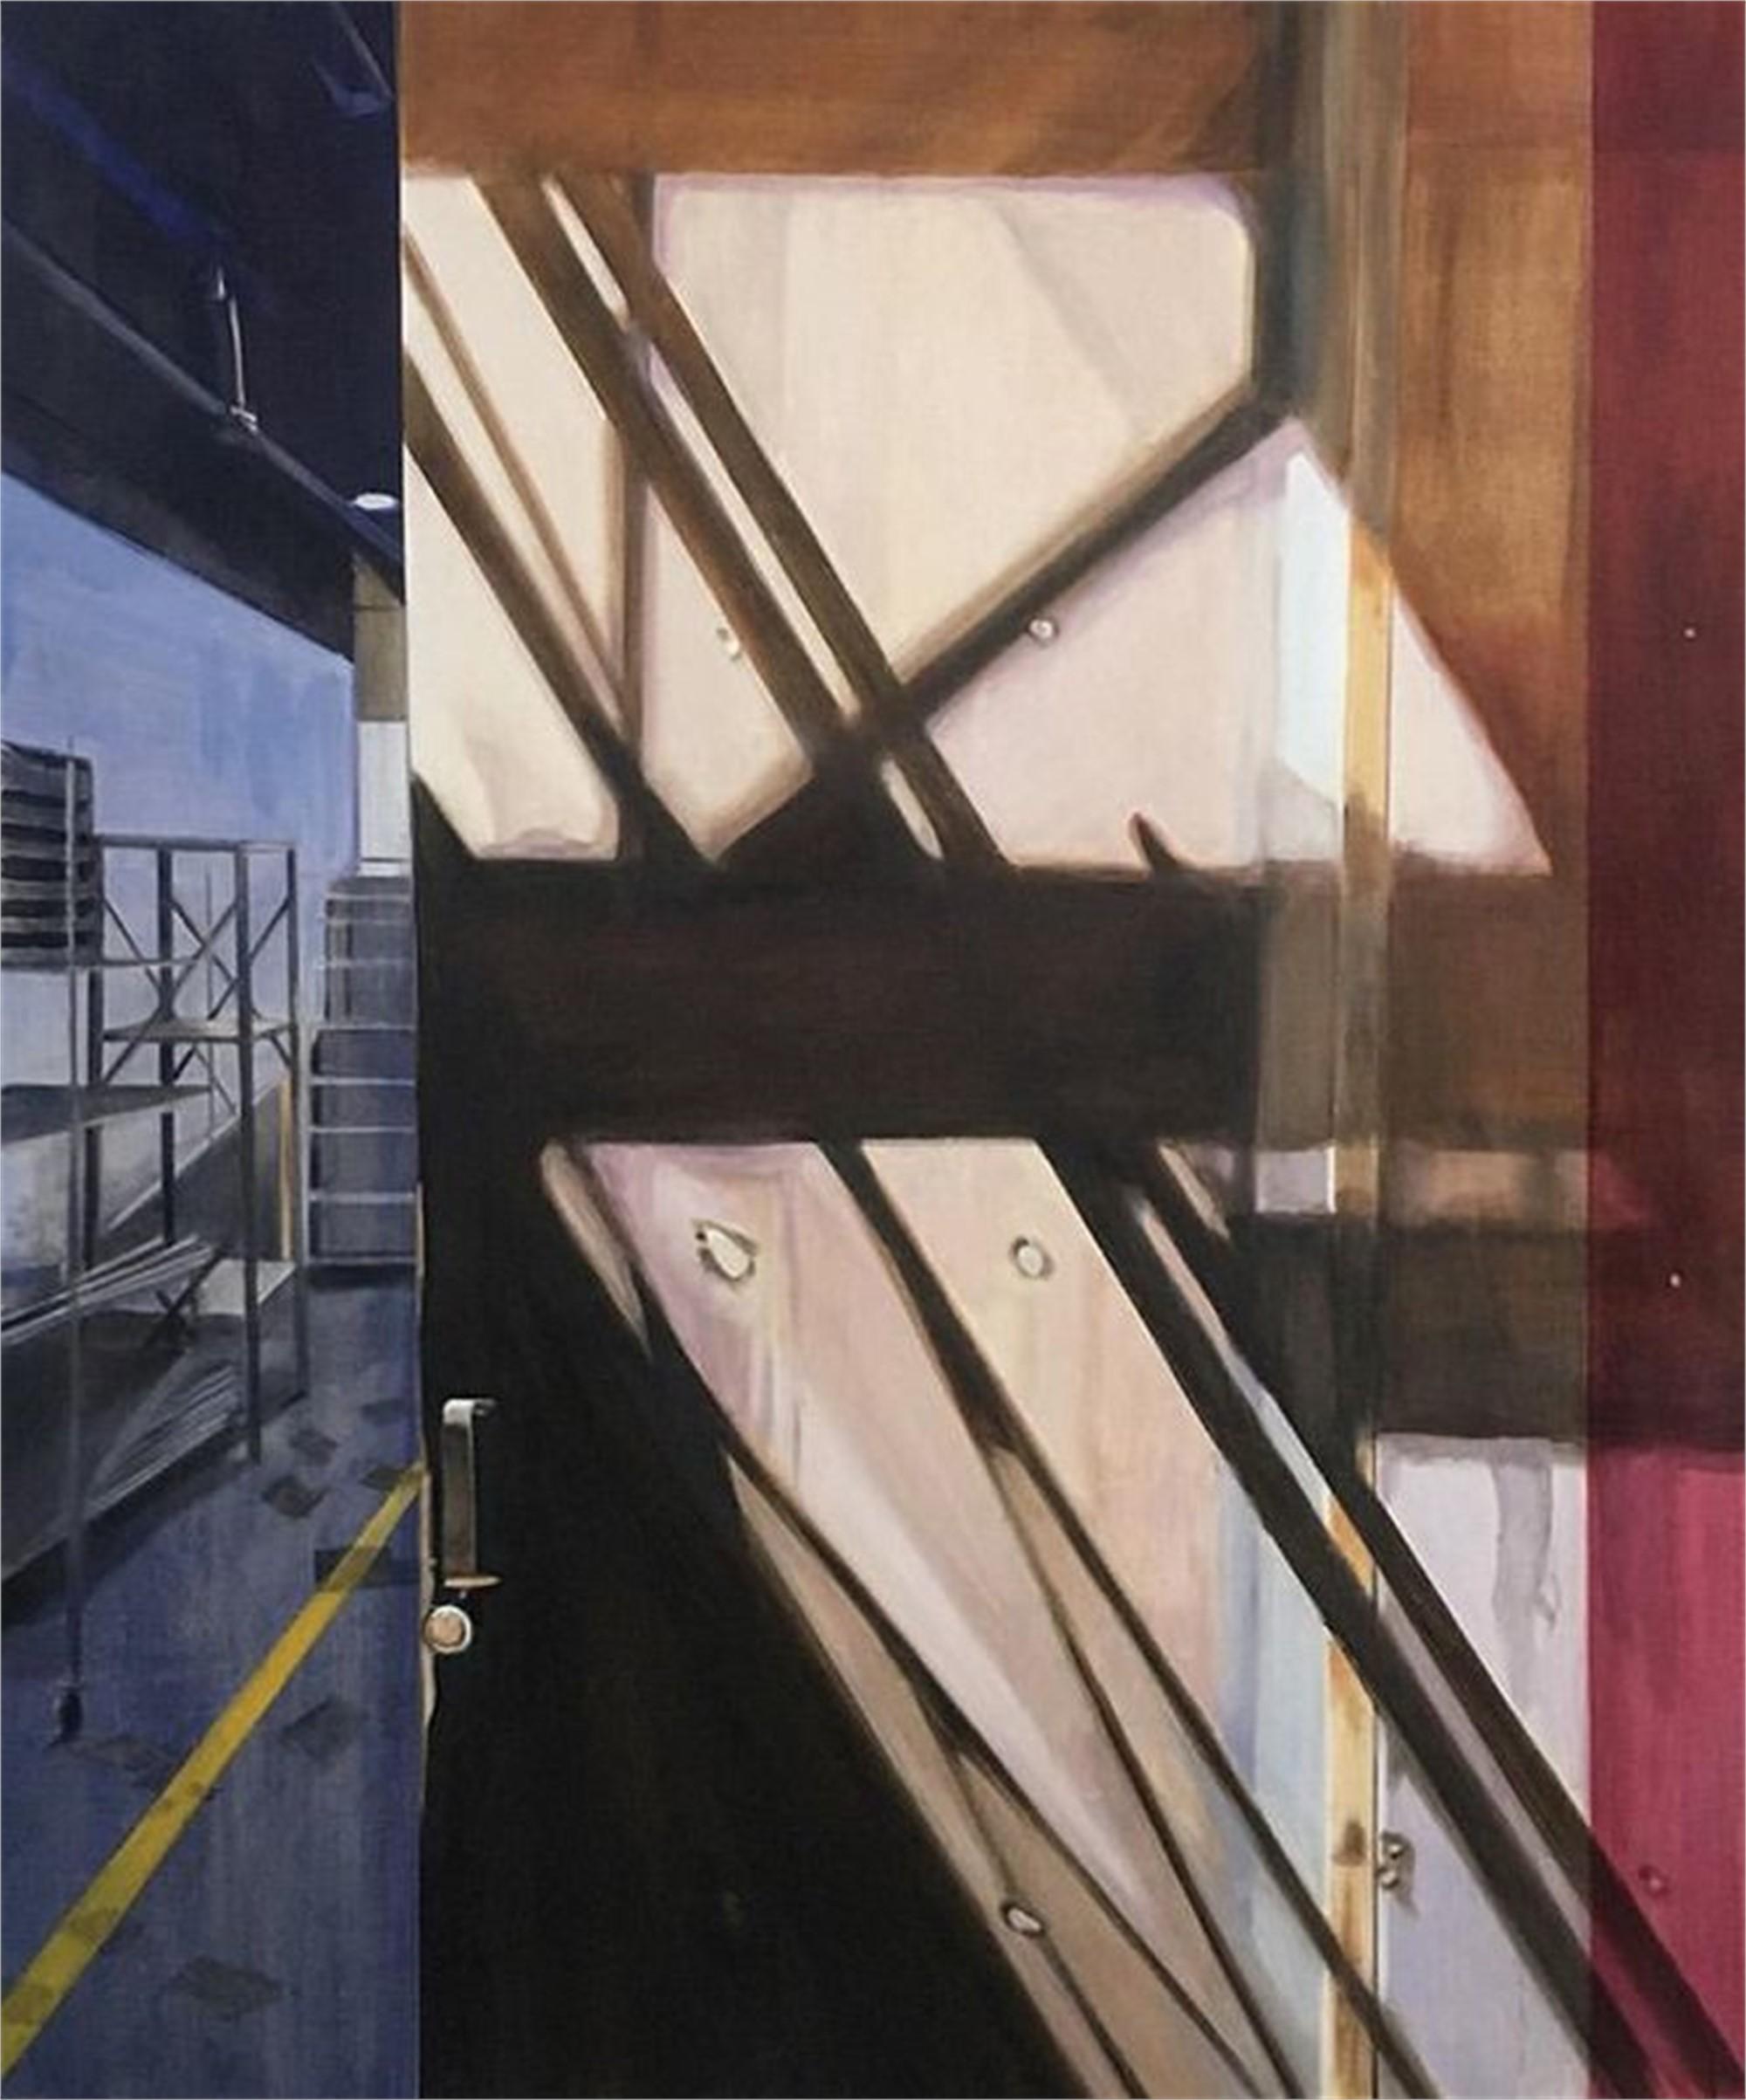 Shadows on a Steel Door by Allan Gorman